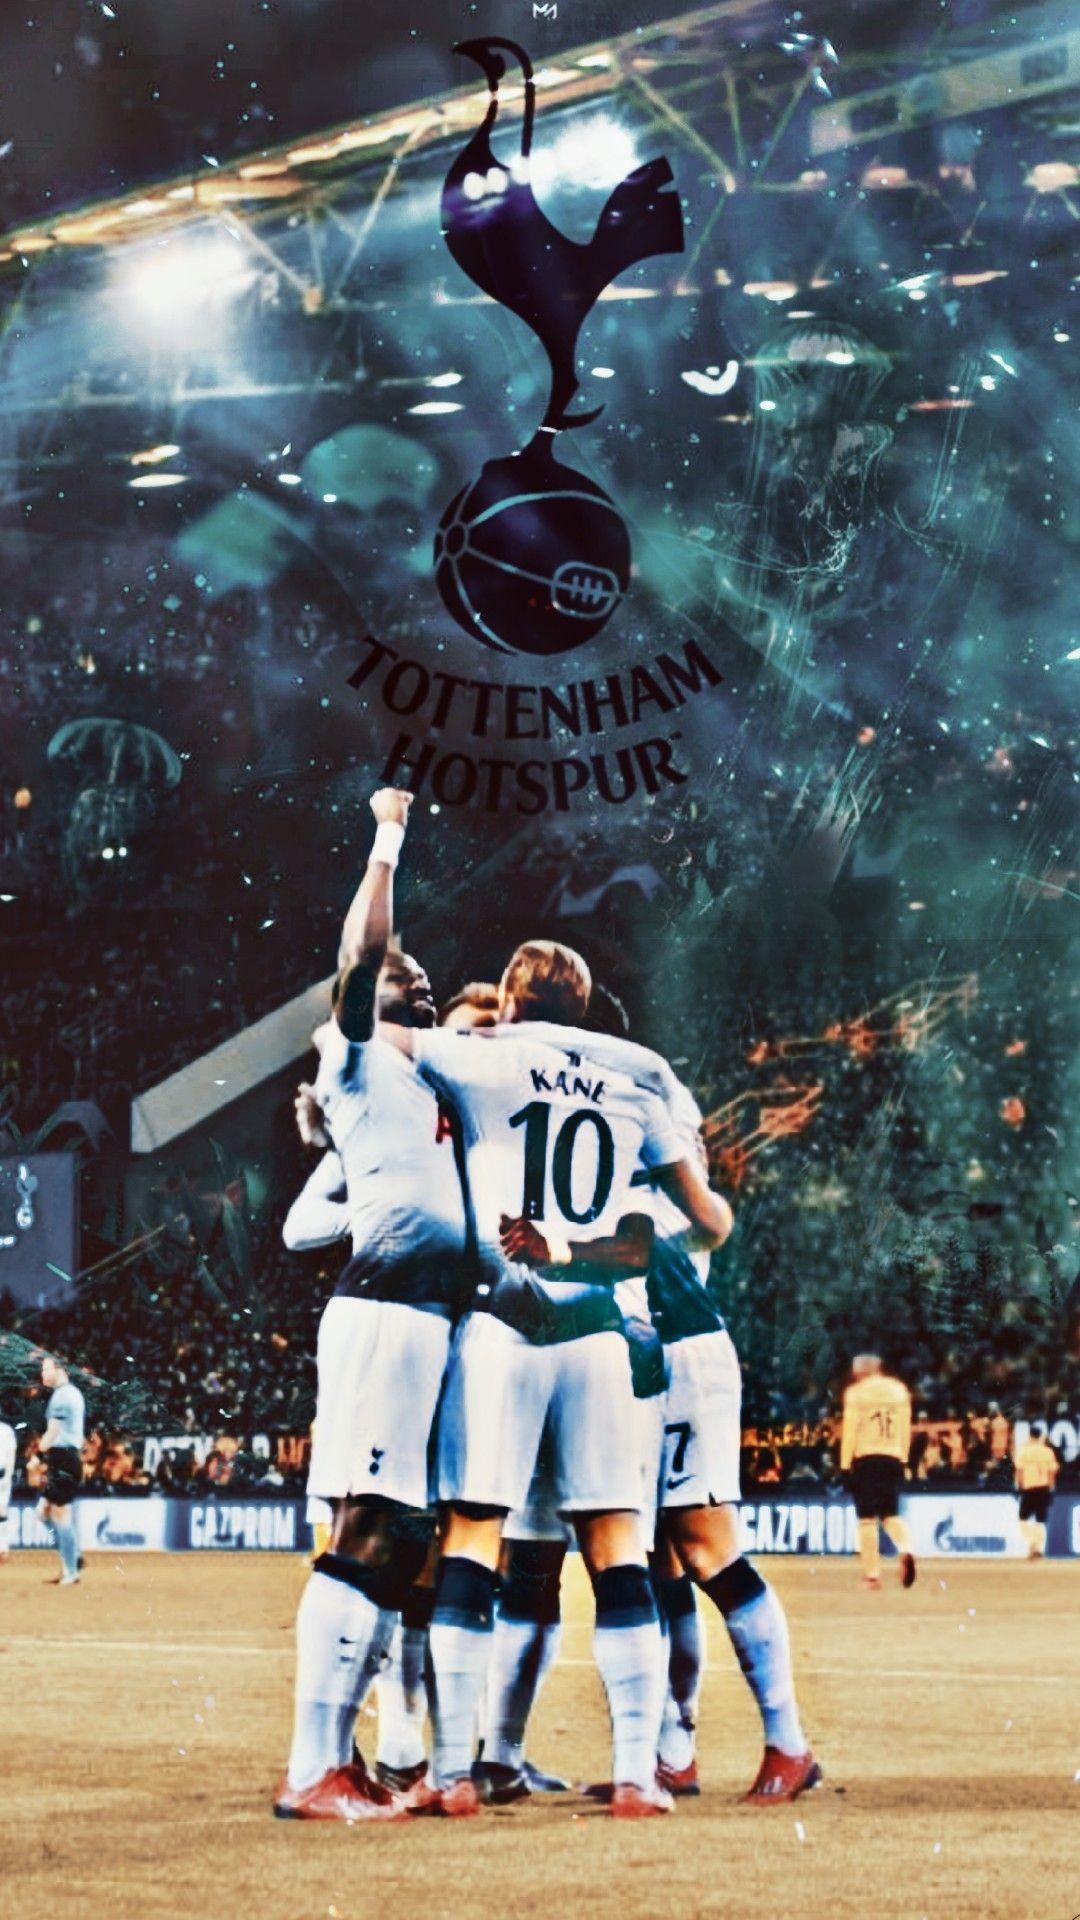 Tottenham Hotspur Tottenham Wallpaper Tottenham Hotspur Tottenham Hotspur Wallpaper